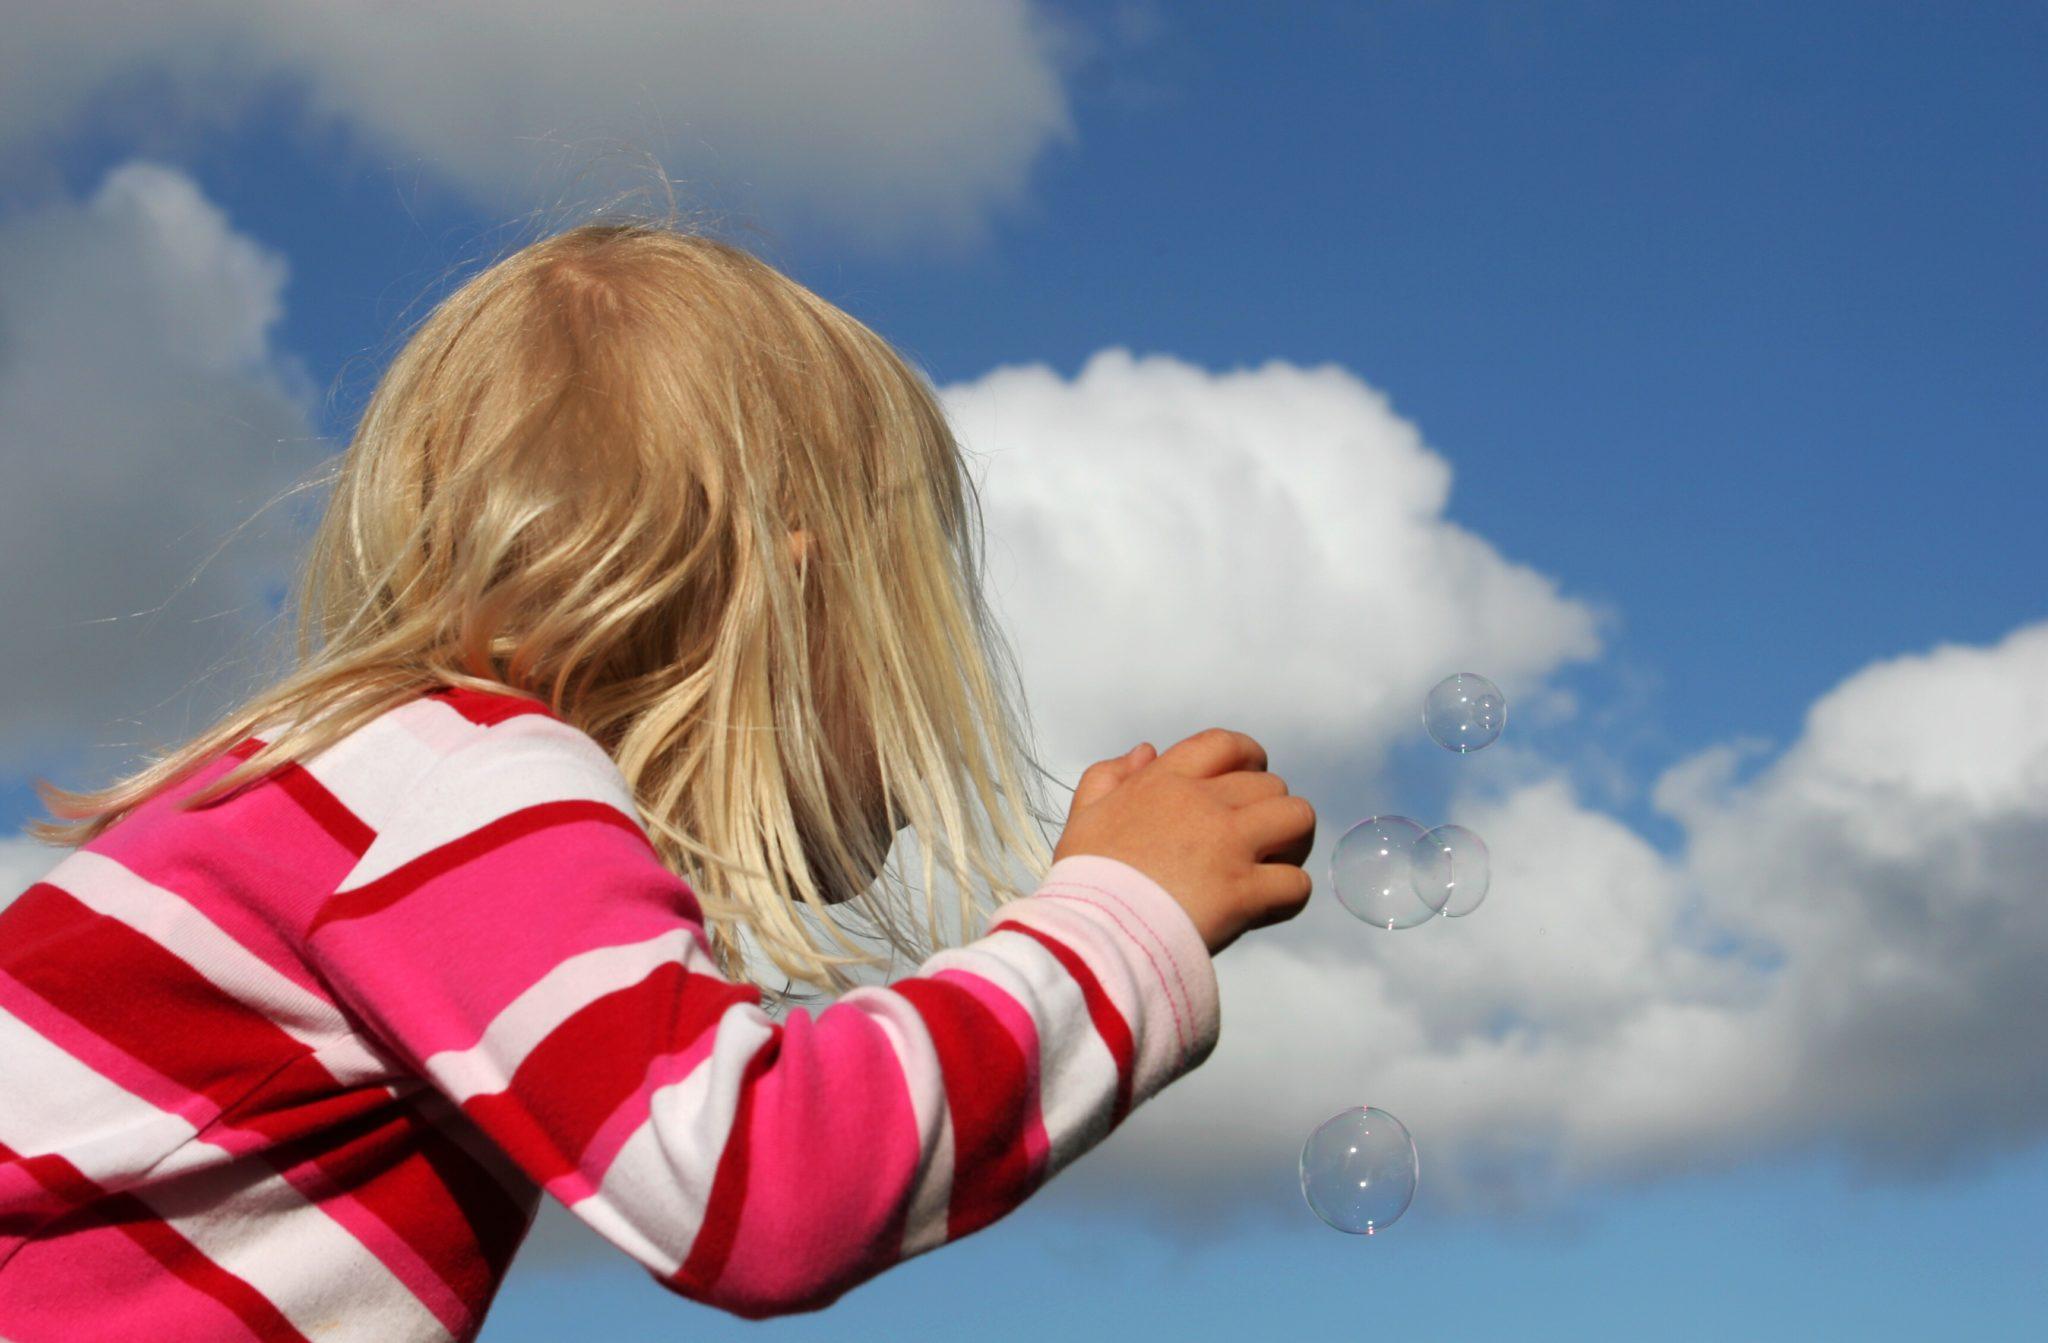 Little girl blowing bubbles.